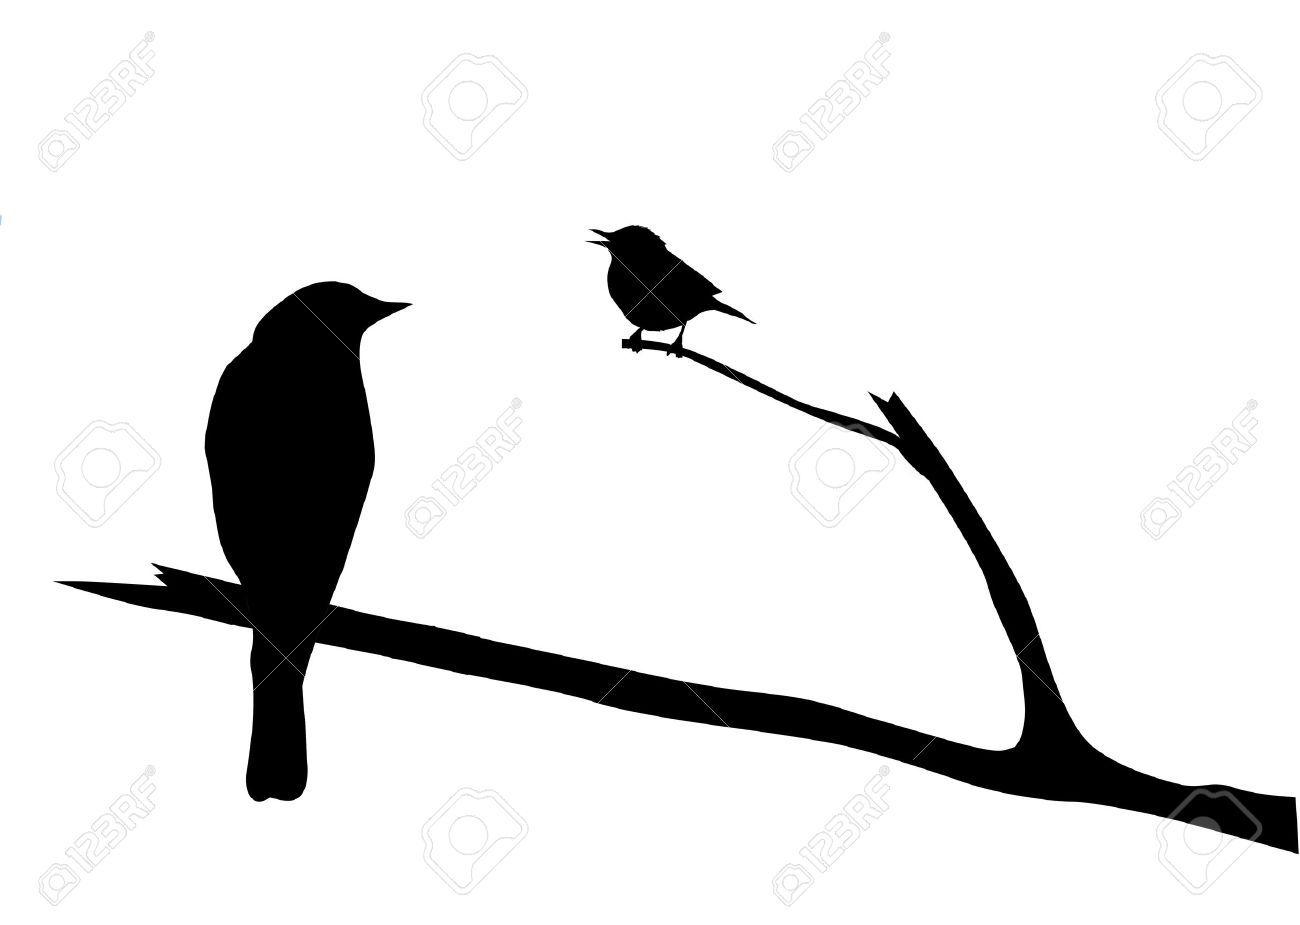 1300x925 Bird Silhouette Stock Vector Illustration And Royalty Free Bird